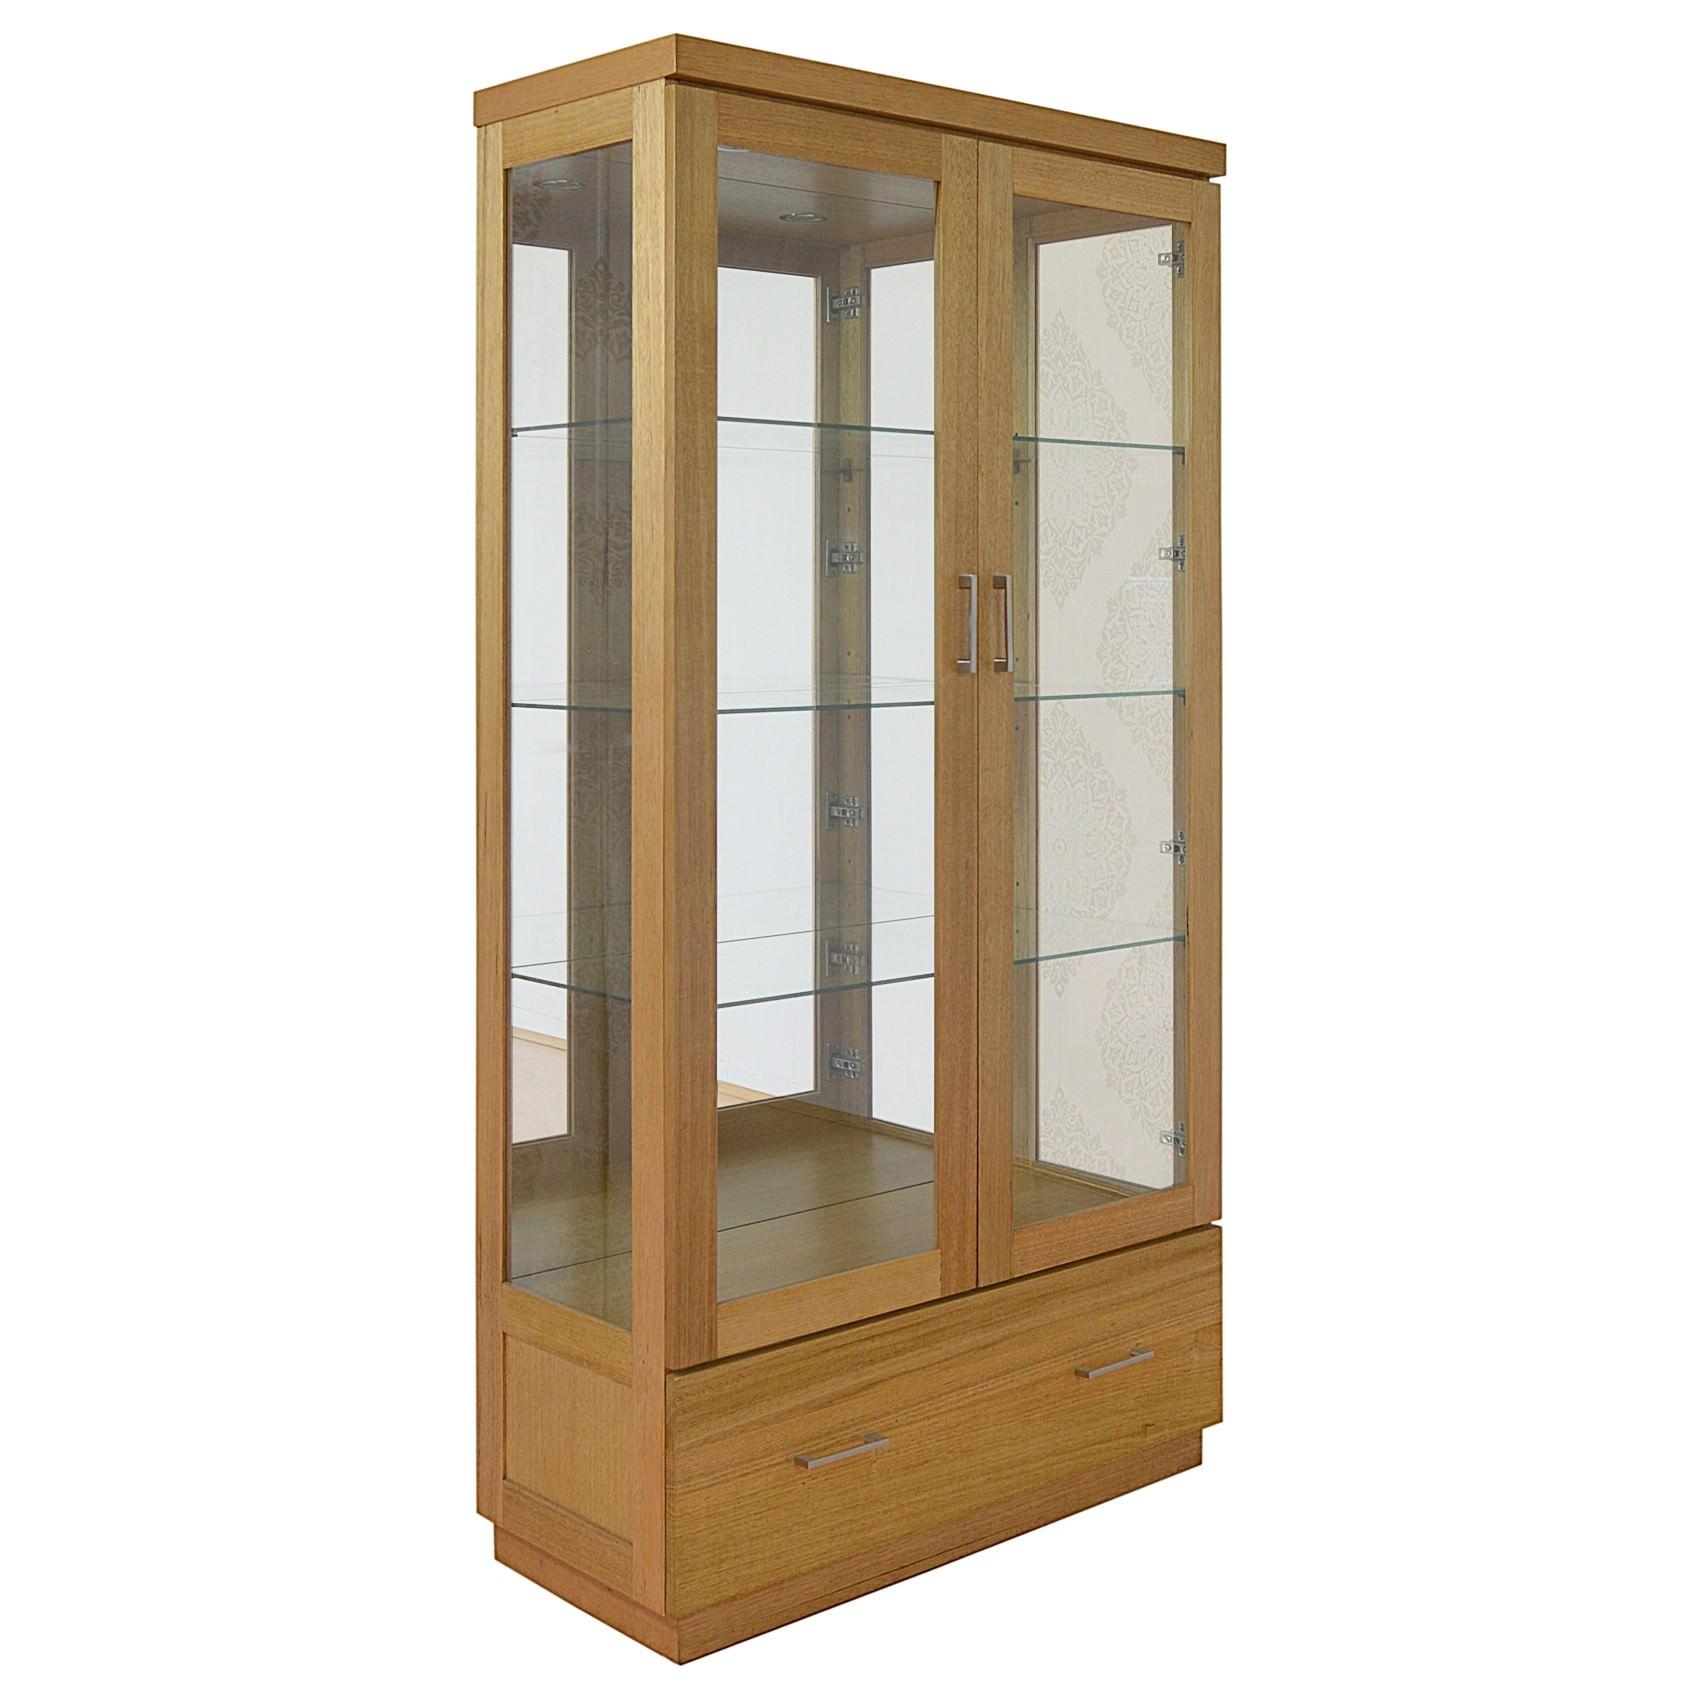 Moselia Tasmanian Oak Timber Display Cabinet, Wheat